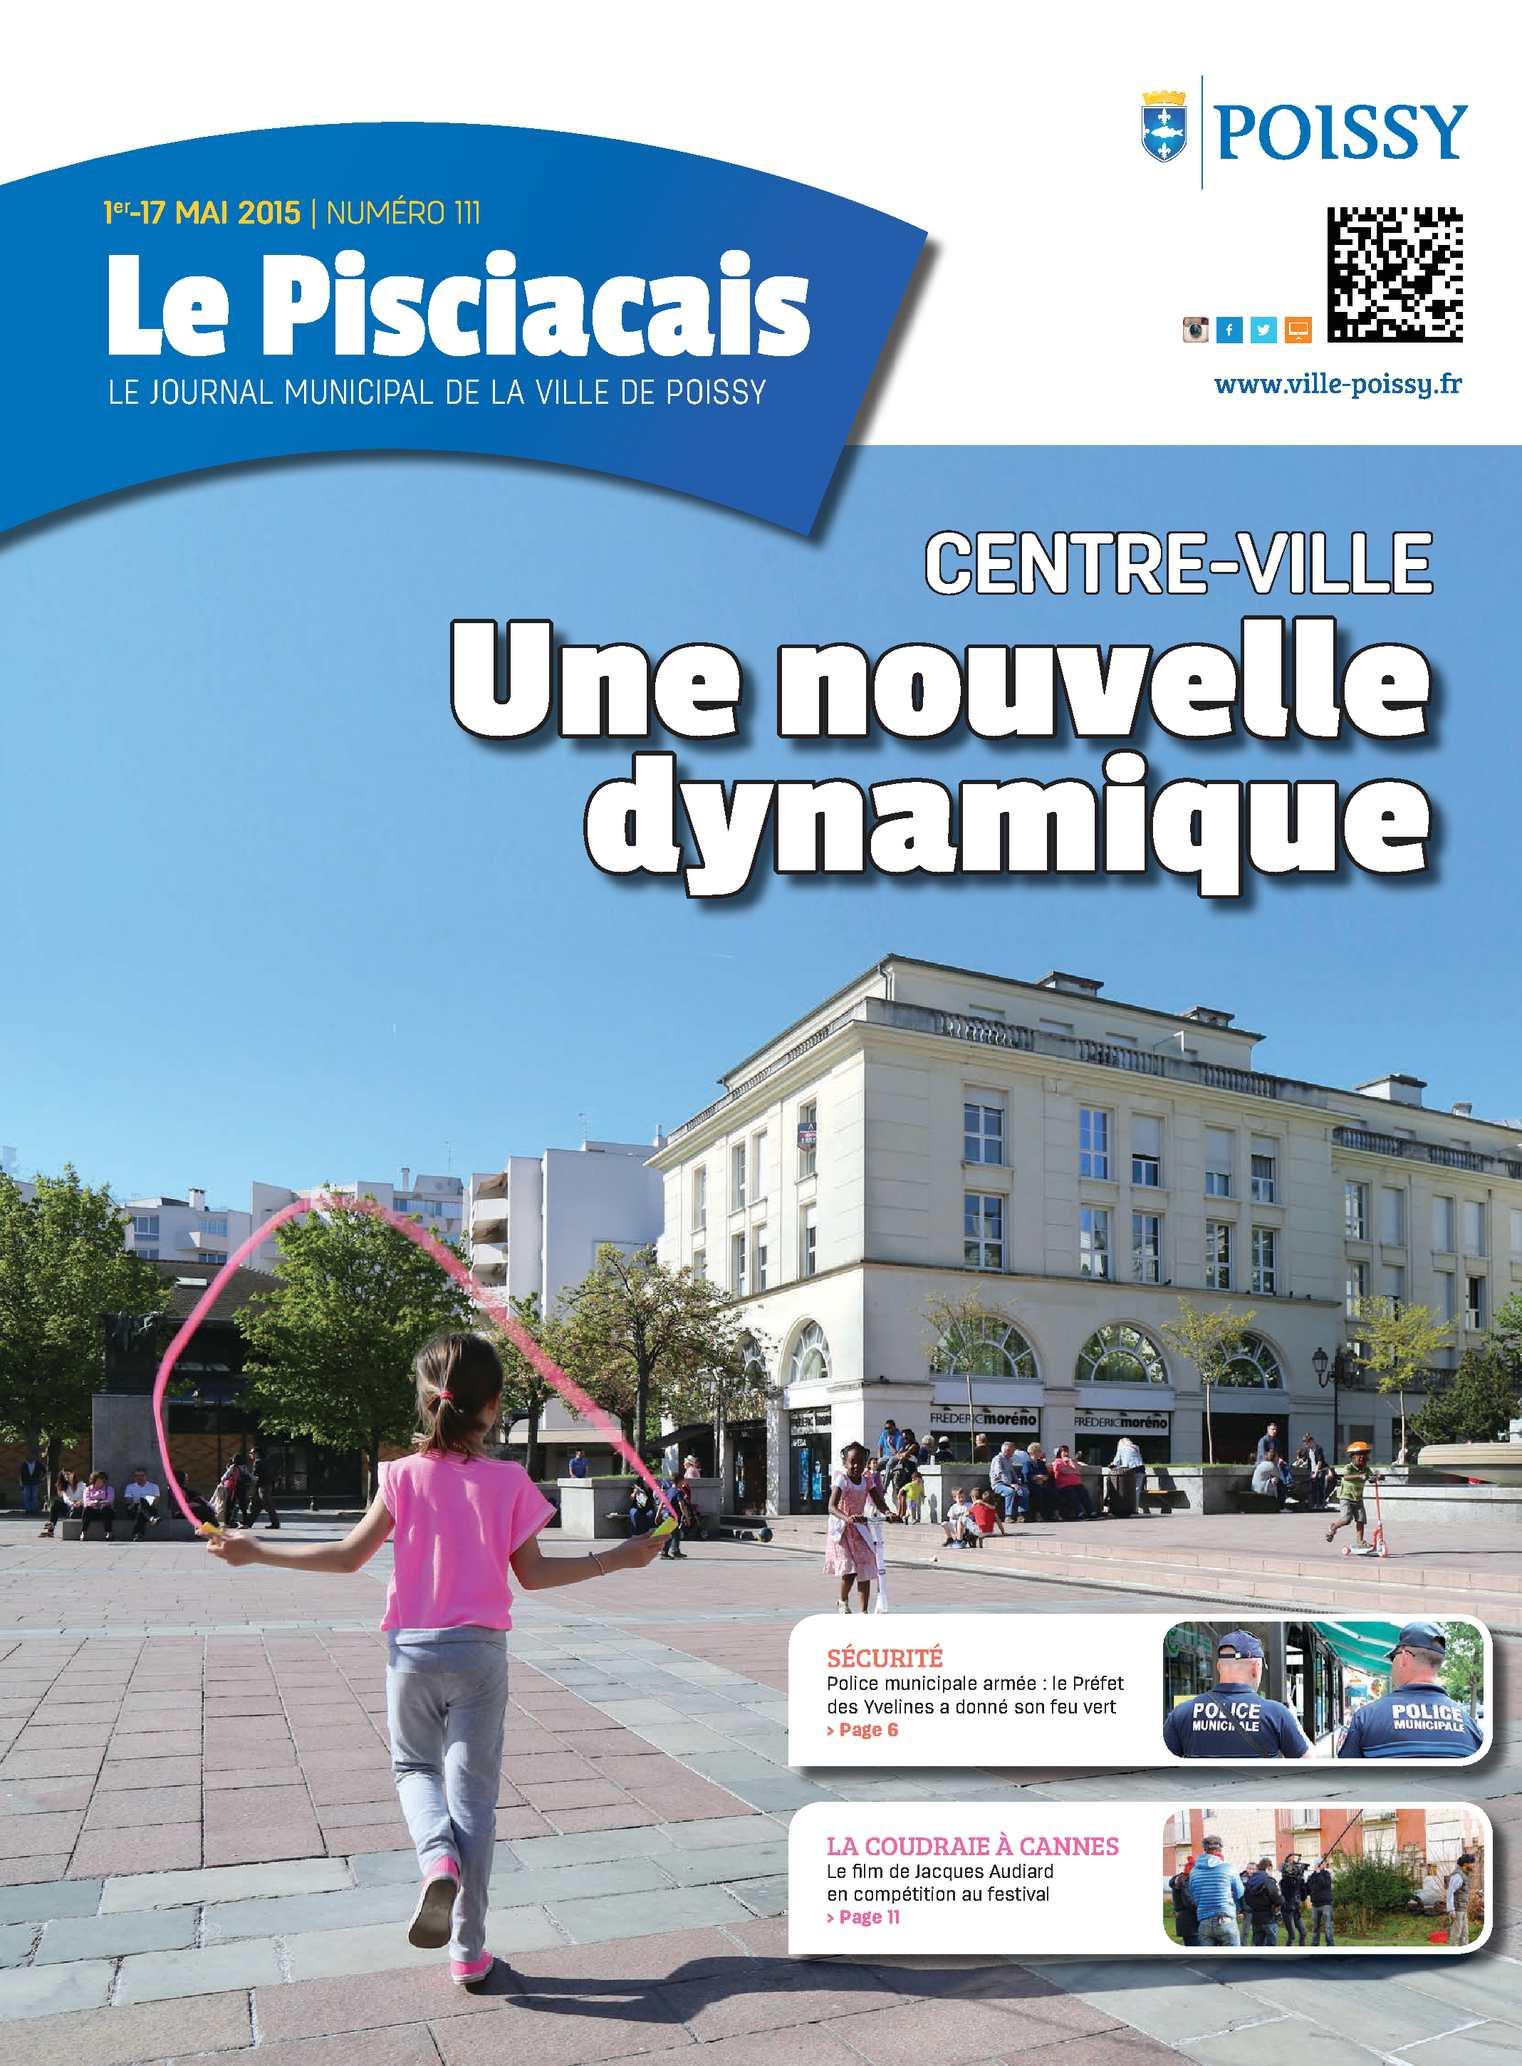 Calam o le pisciacais 111 for Cannes piscine municipale